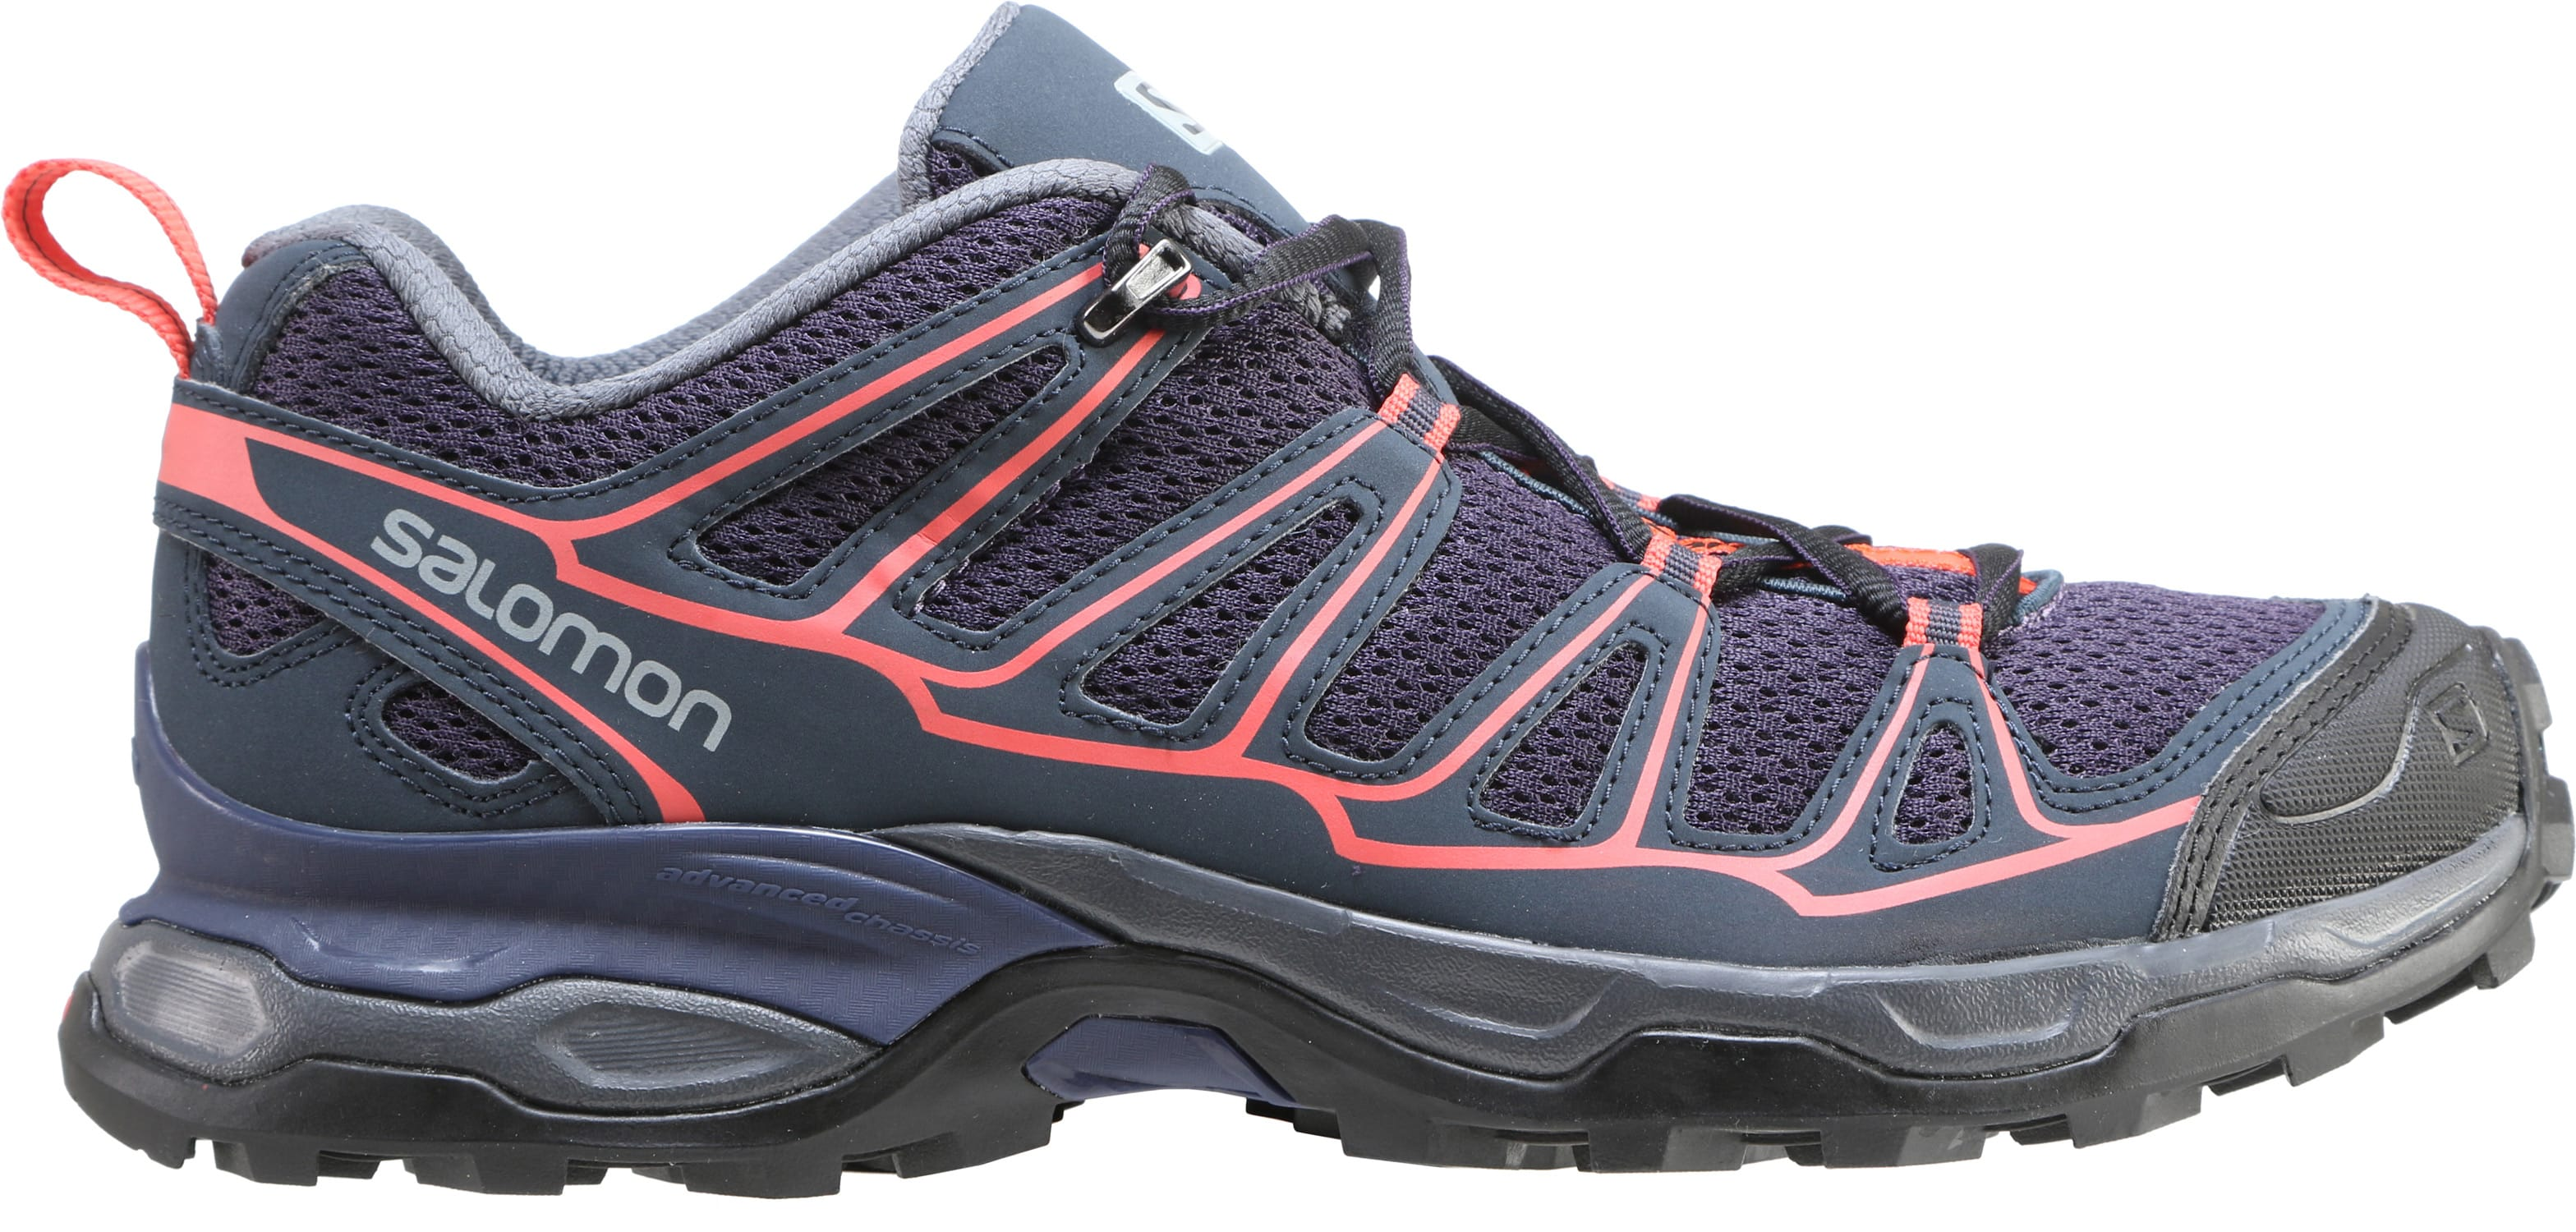 Salomon Ultra Prime Womens Shoe